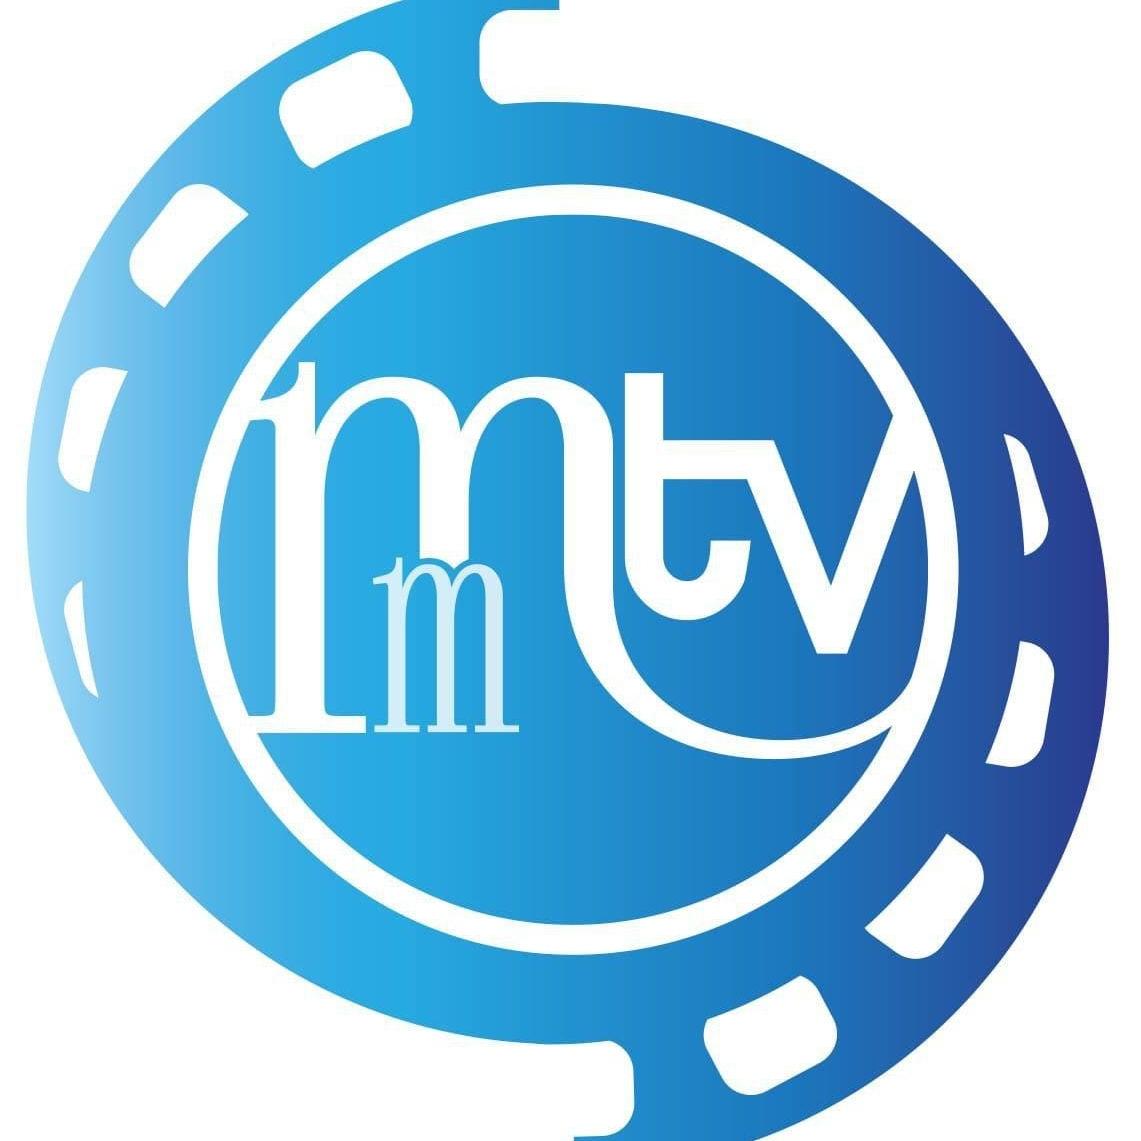 MondoMigliore.tv